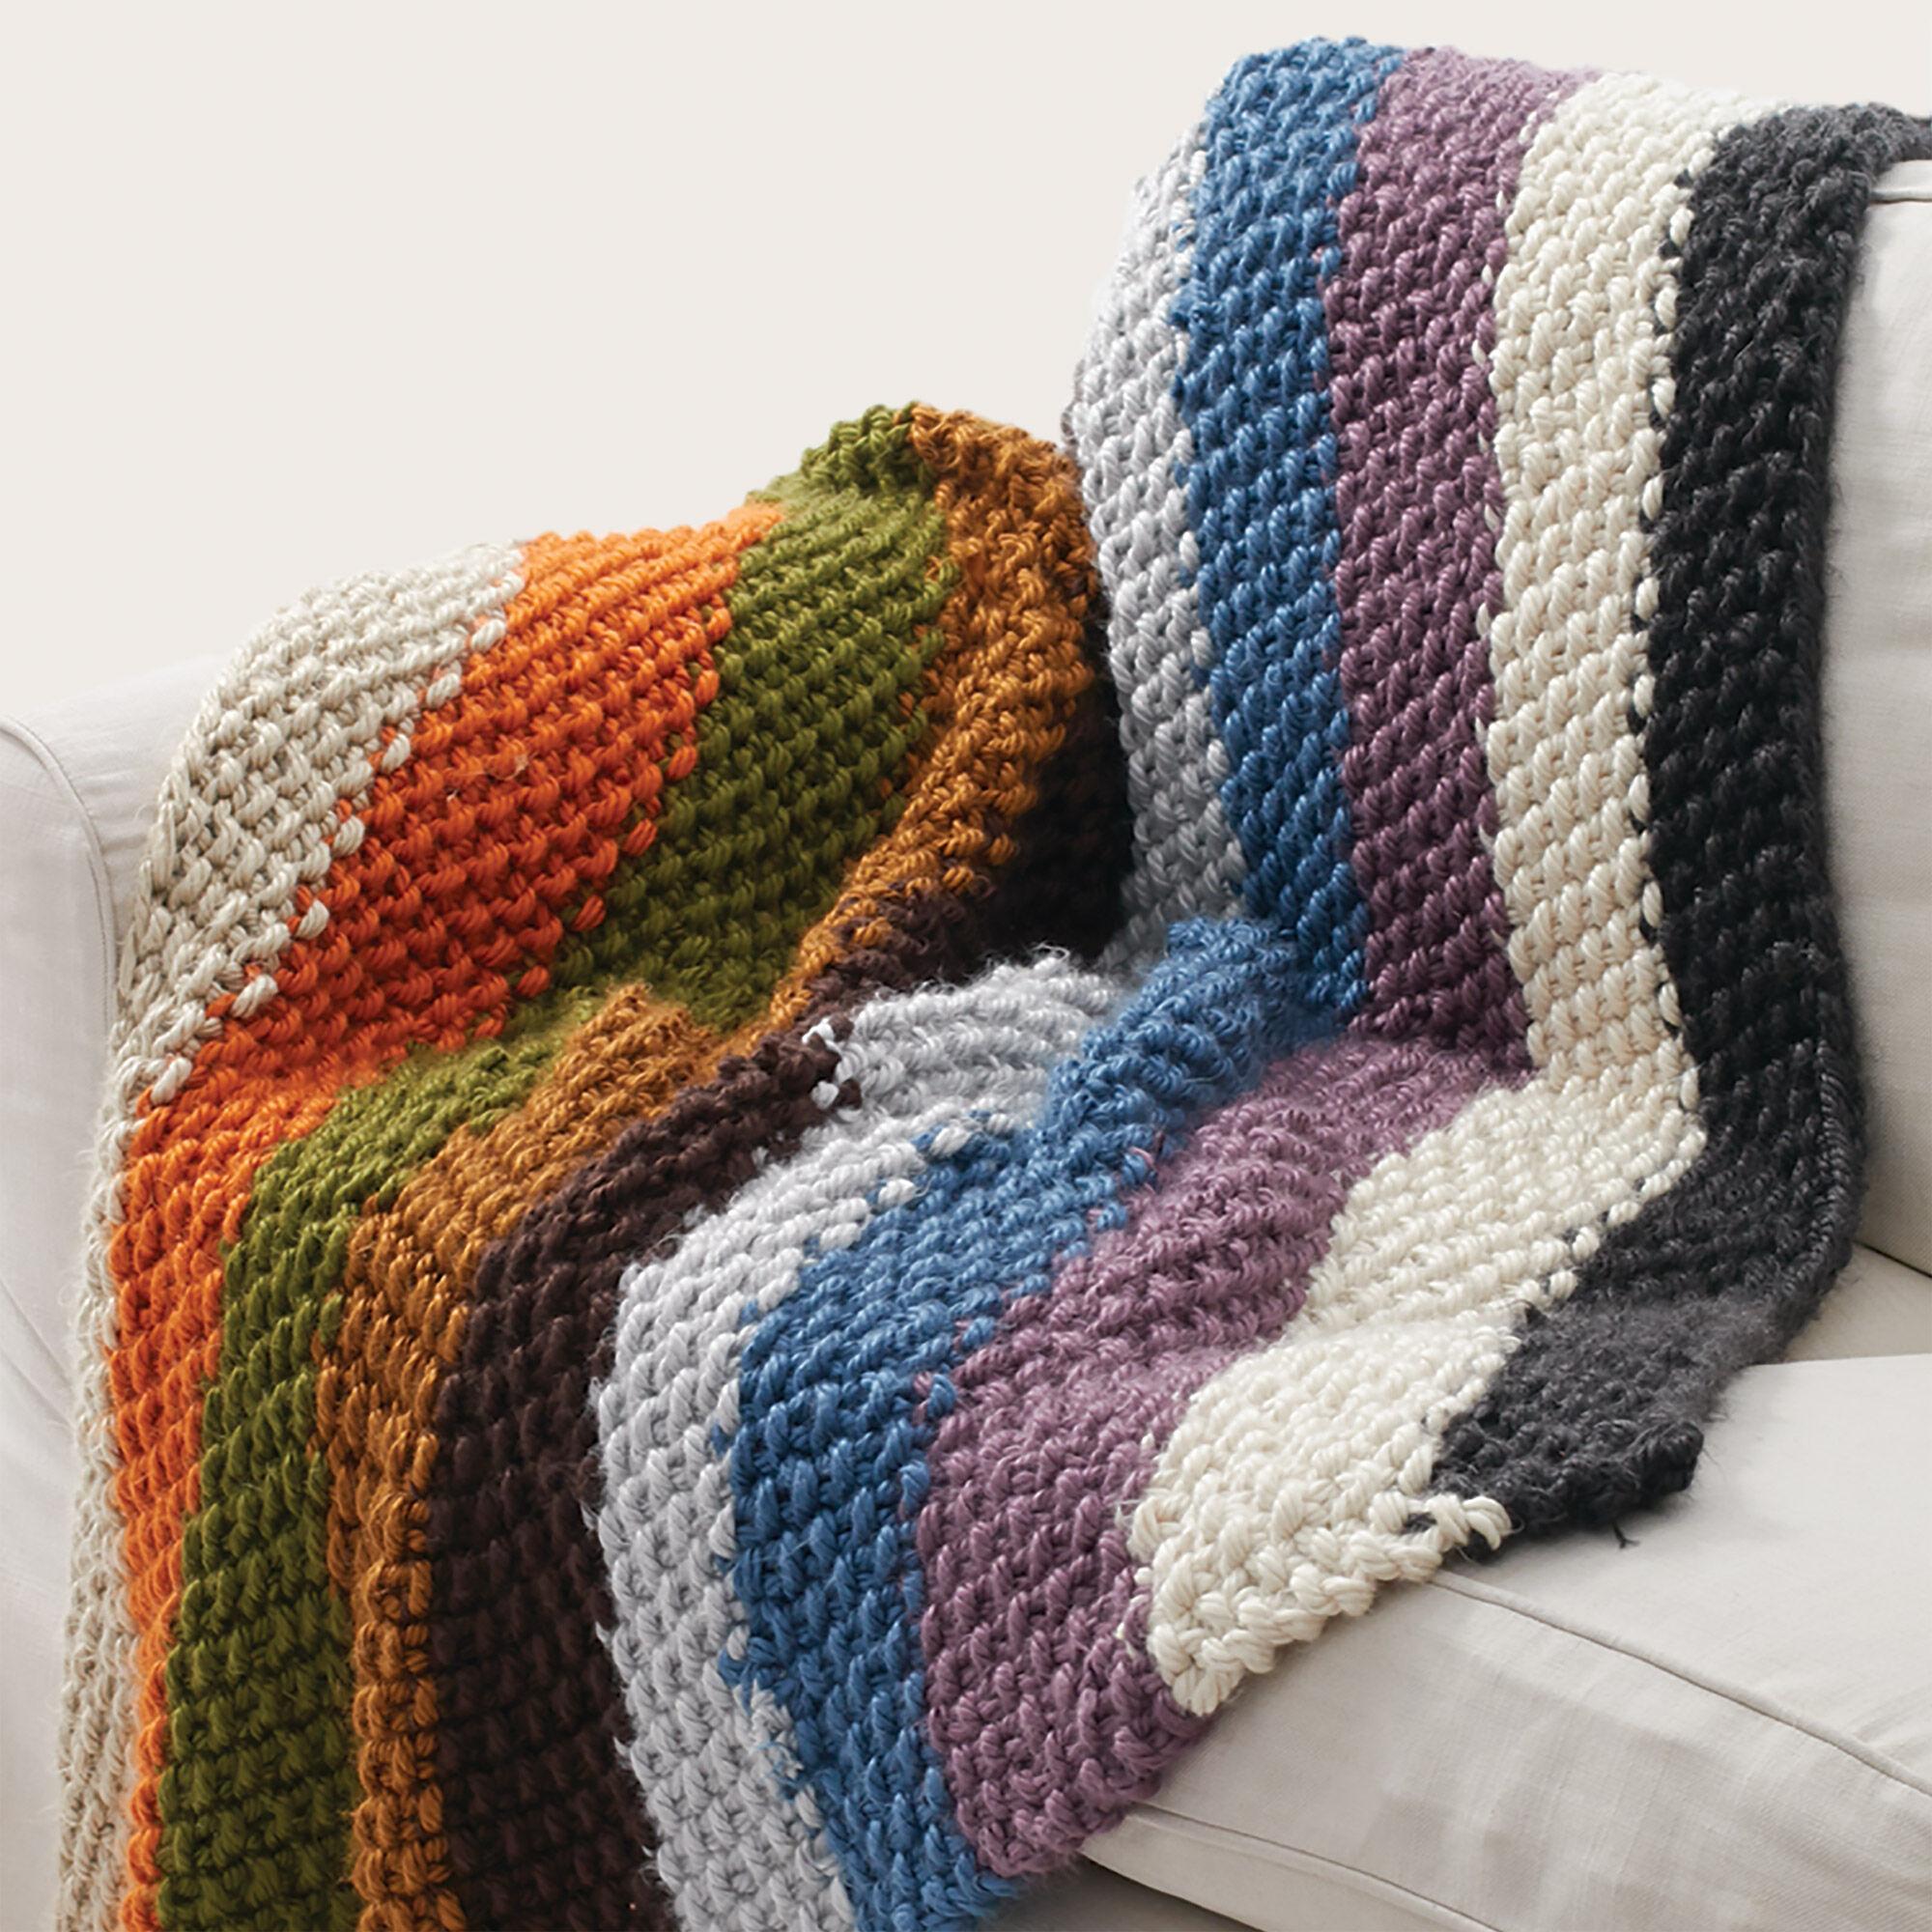 Bernat Seed Stitch Blanket | Yarnspirations